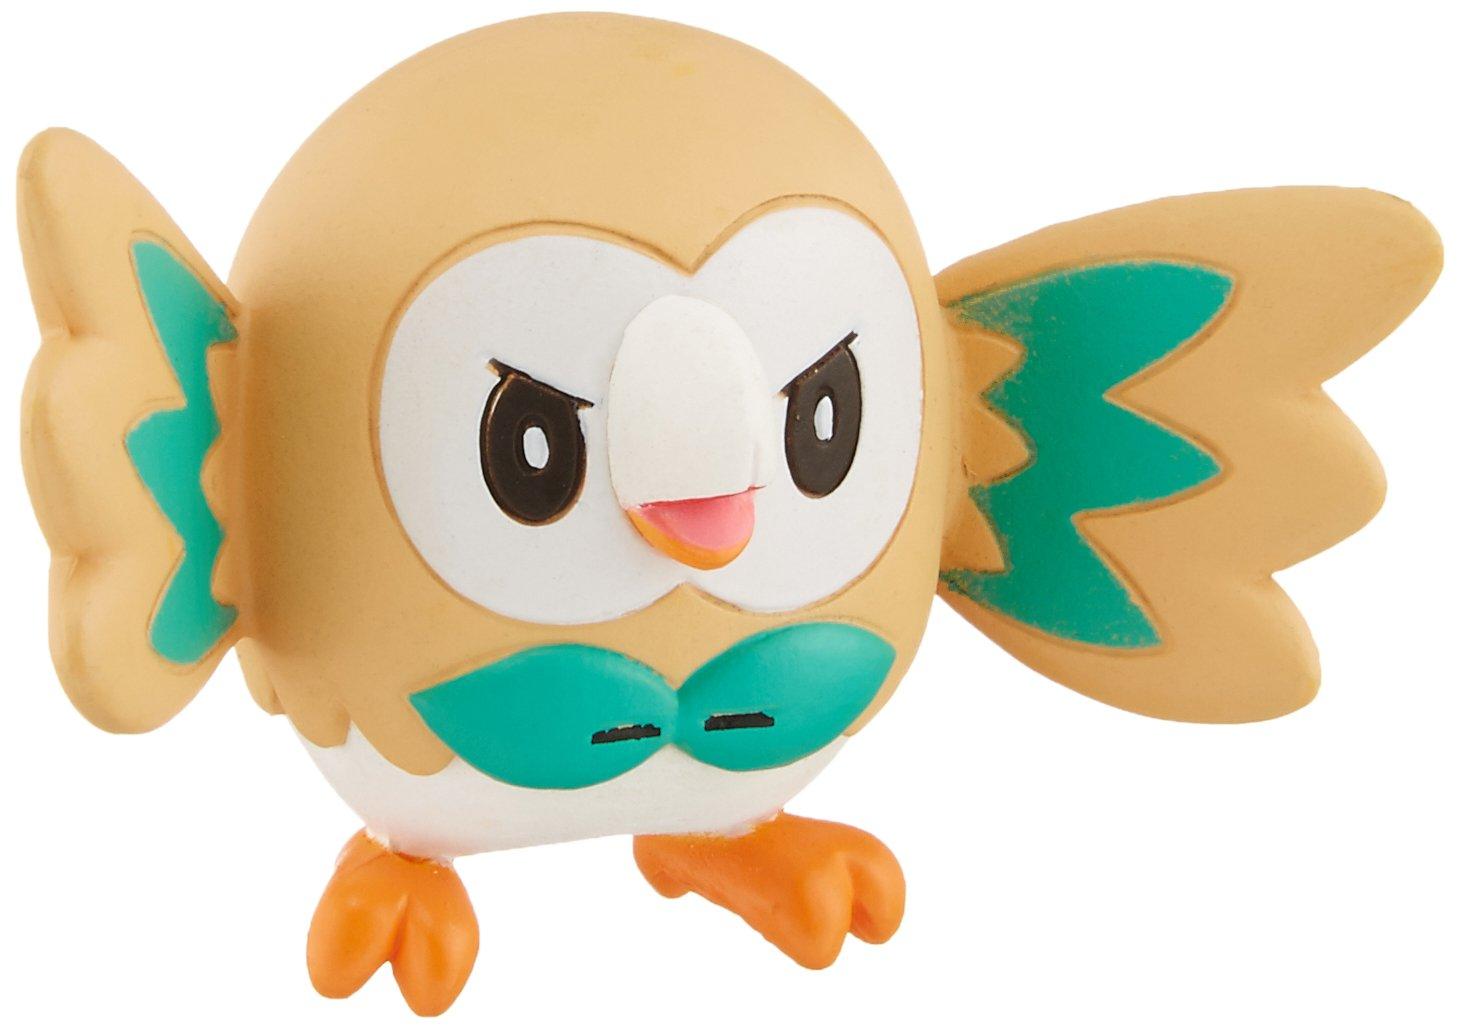 Takaratomy EX EMC-02 Pokemon Rowlet Mini Action Figur 1.5-Inch JBK International 4904810863700